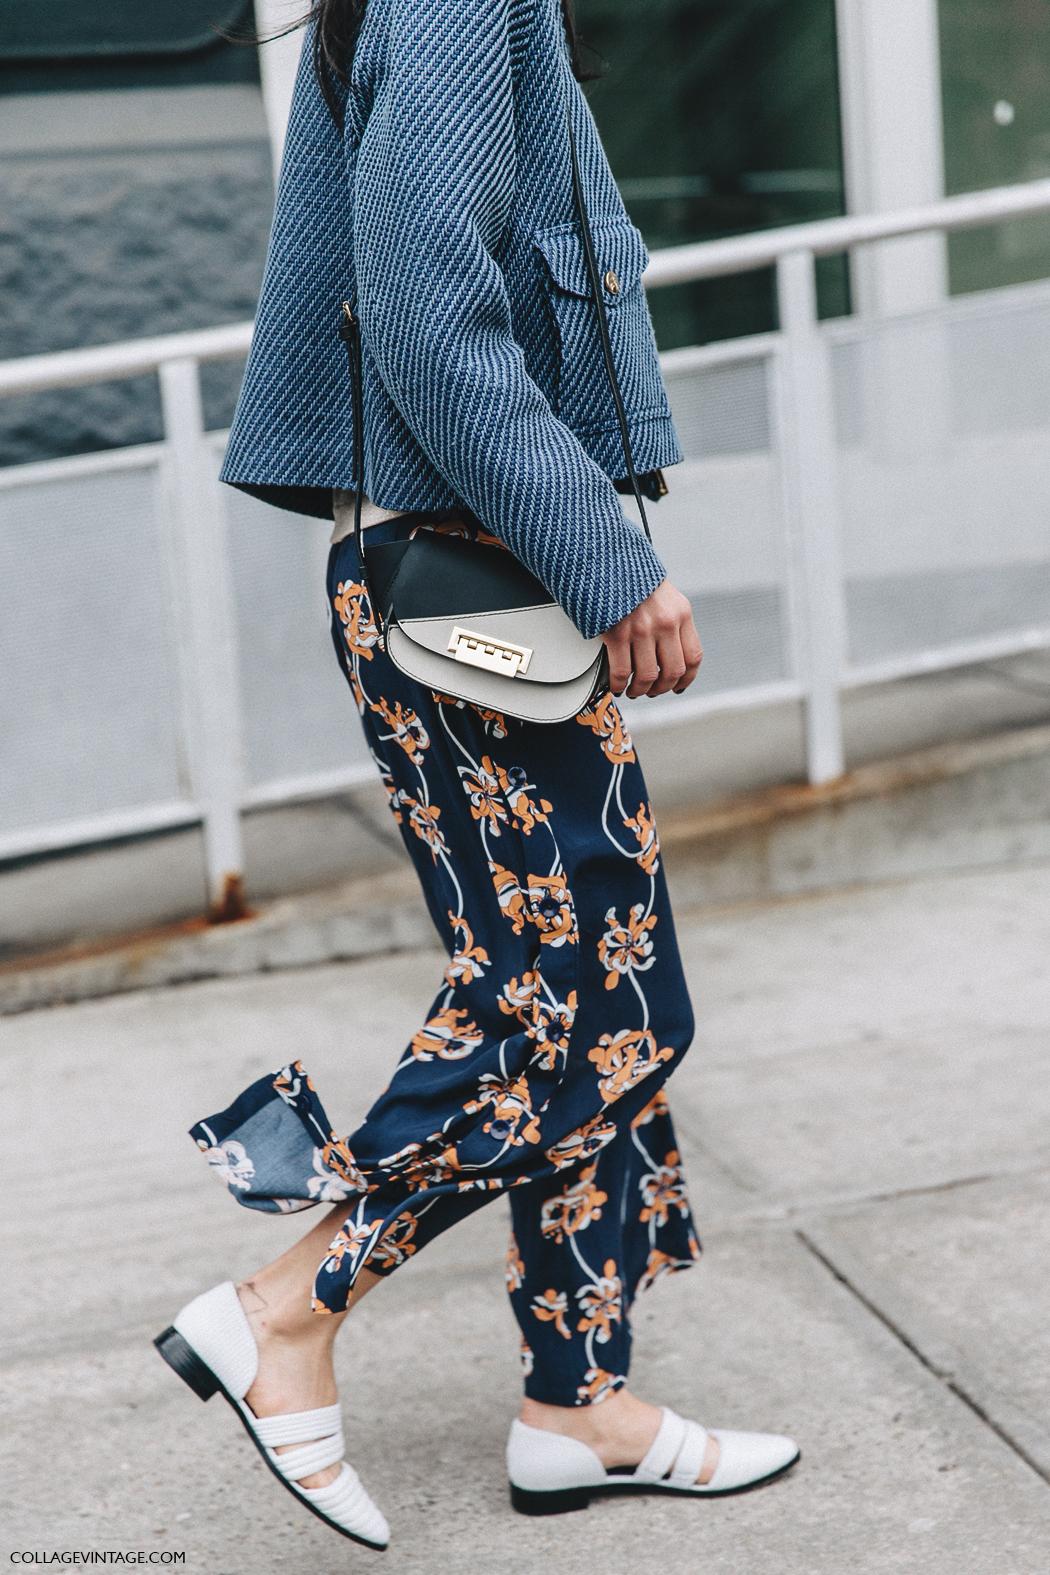 NYFW-New_York_Fashion_Week-Fall_Winter-17-Street_Style-Light_Blue_Jacket-Printed_Trousers-3